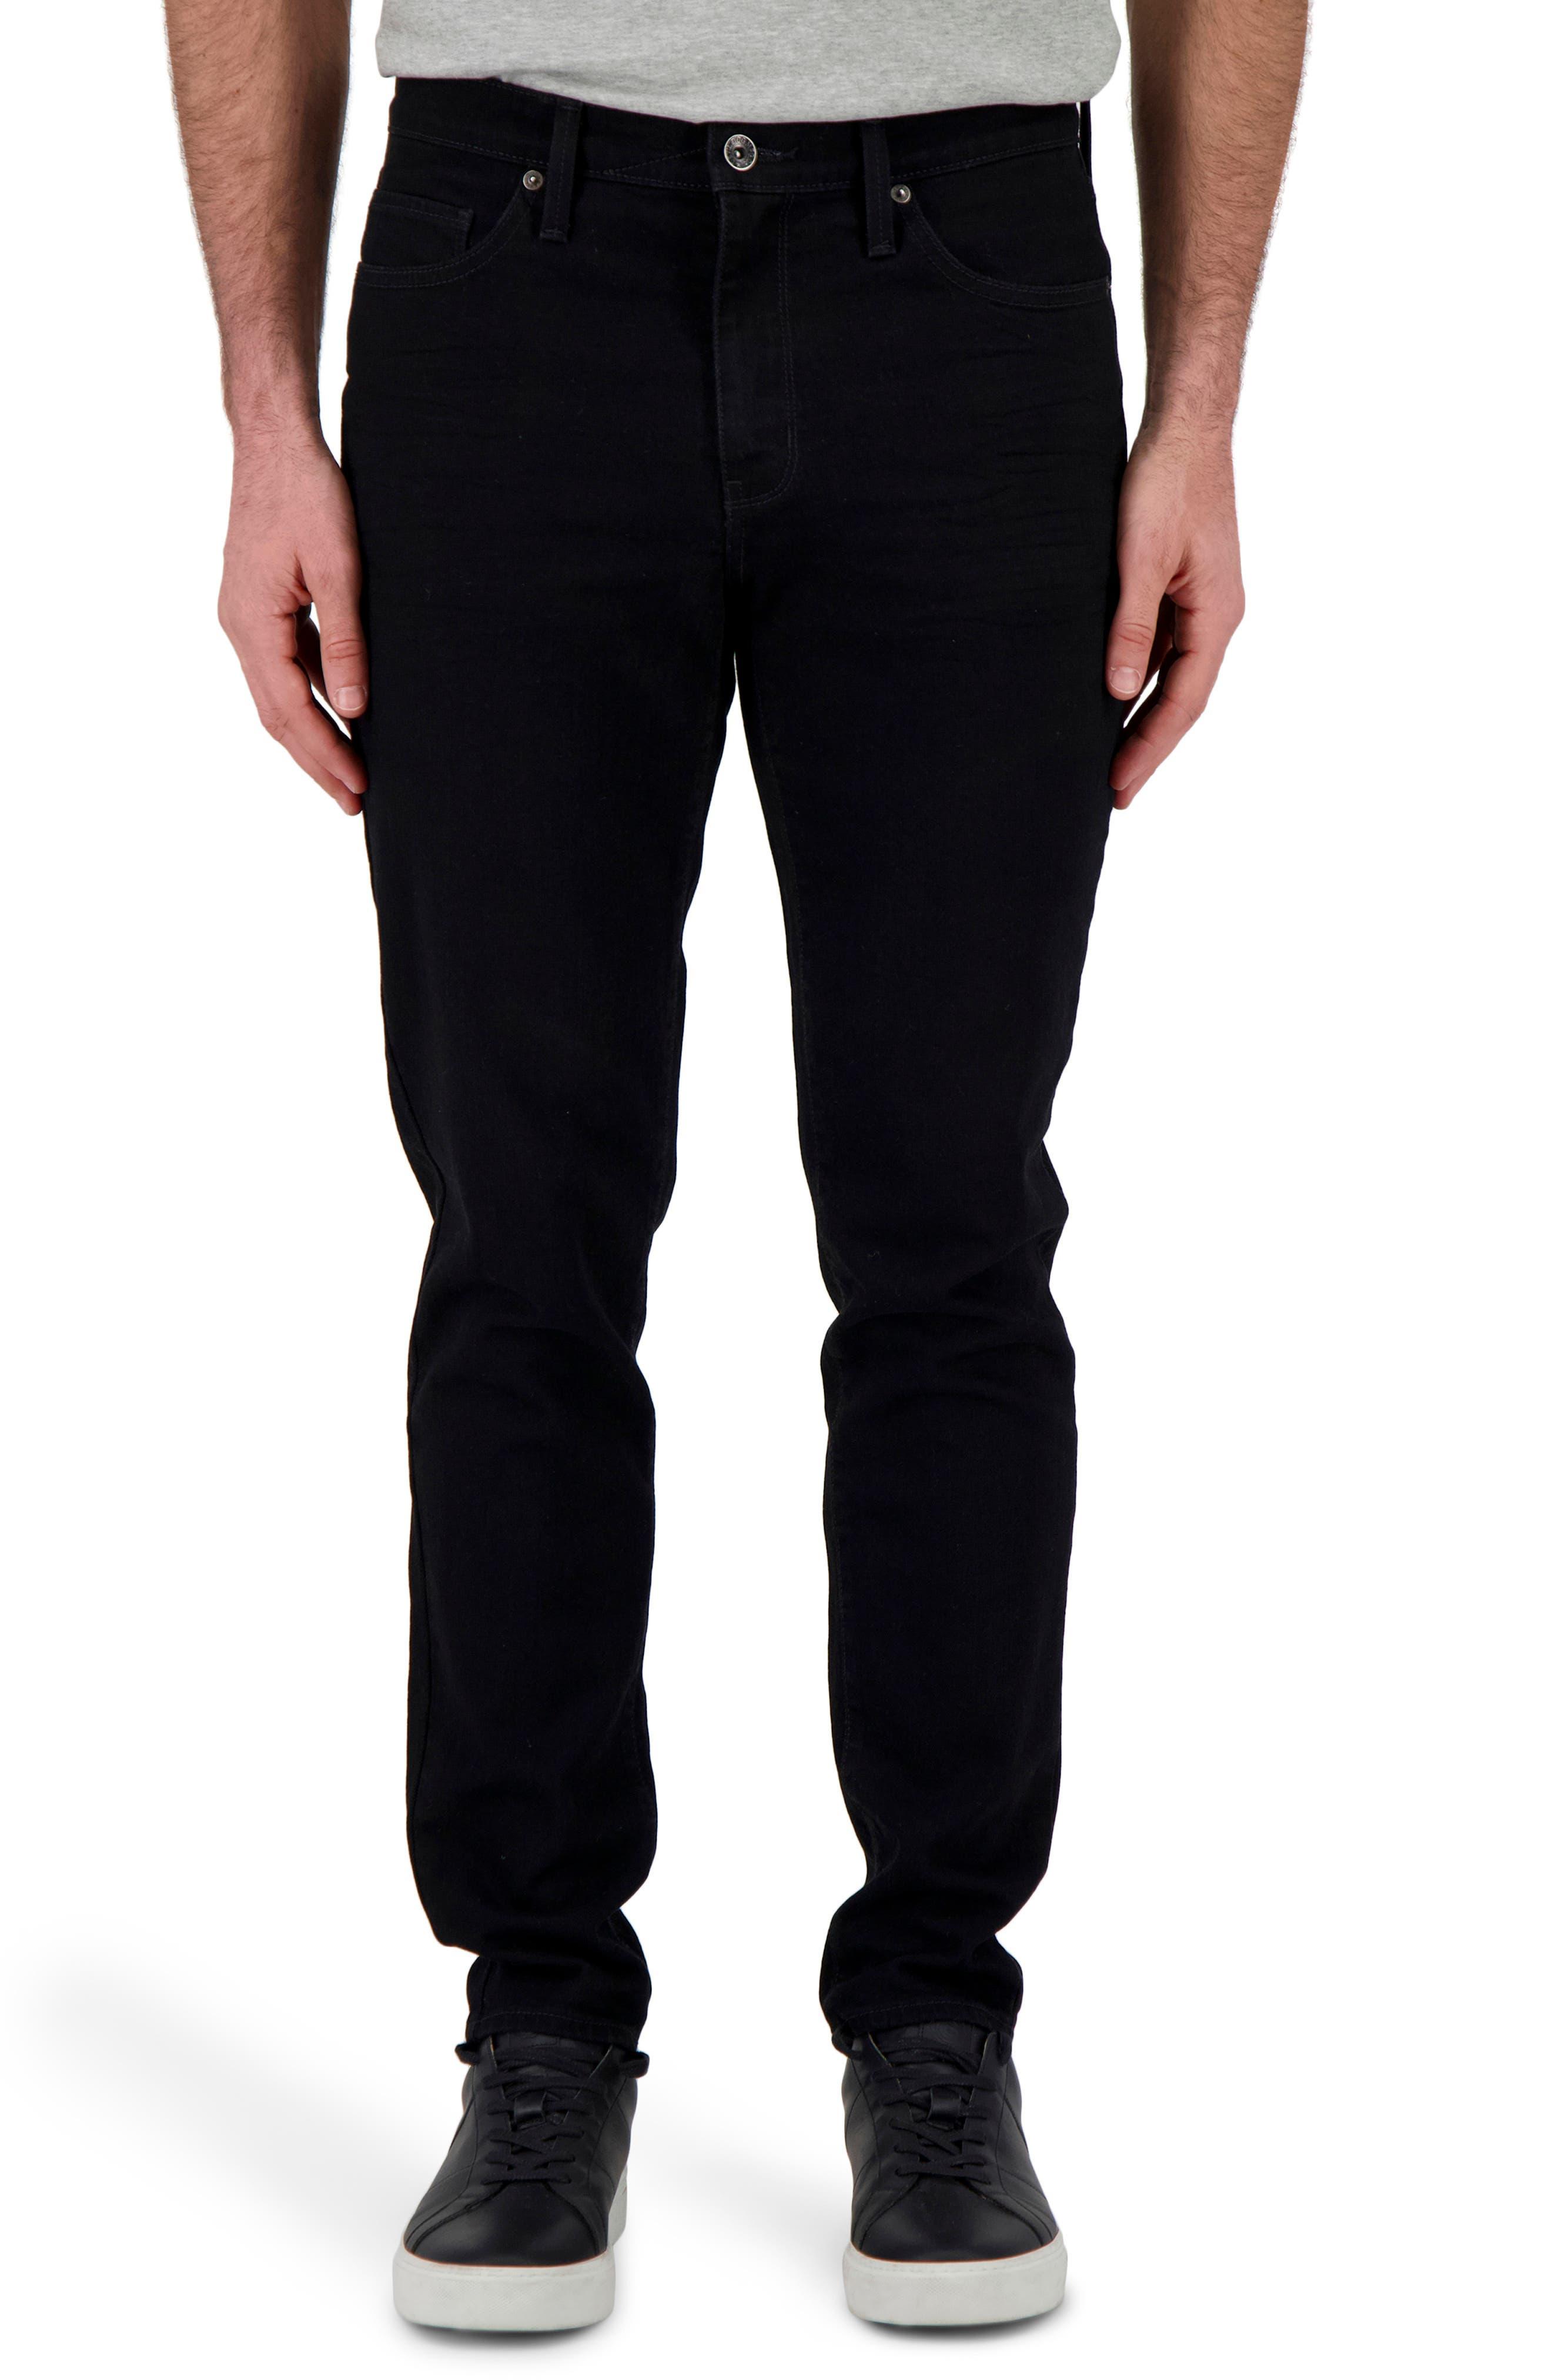 Men's Devil-Dog Dungarees Slim Straight Fit Performance Stretch Jeans,  36 x 32 - Black